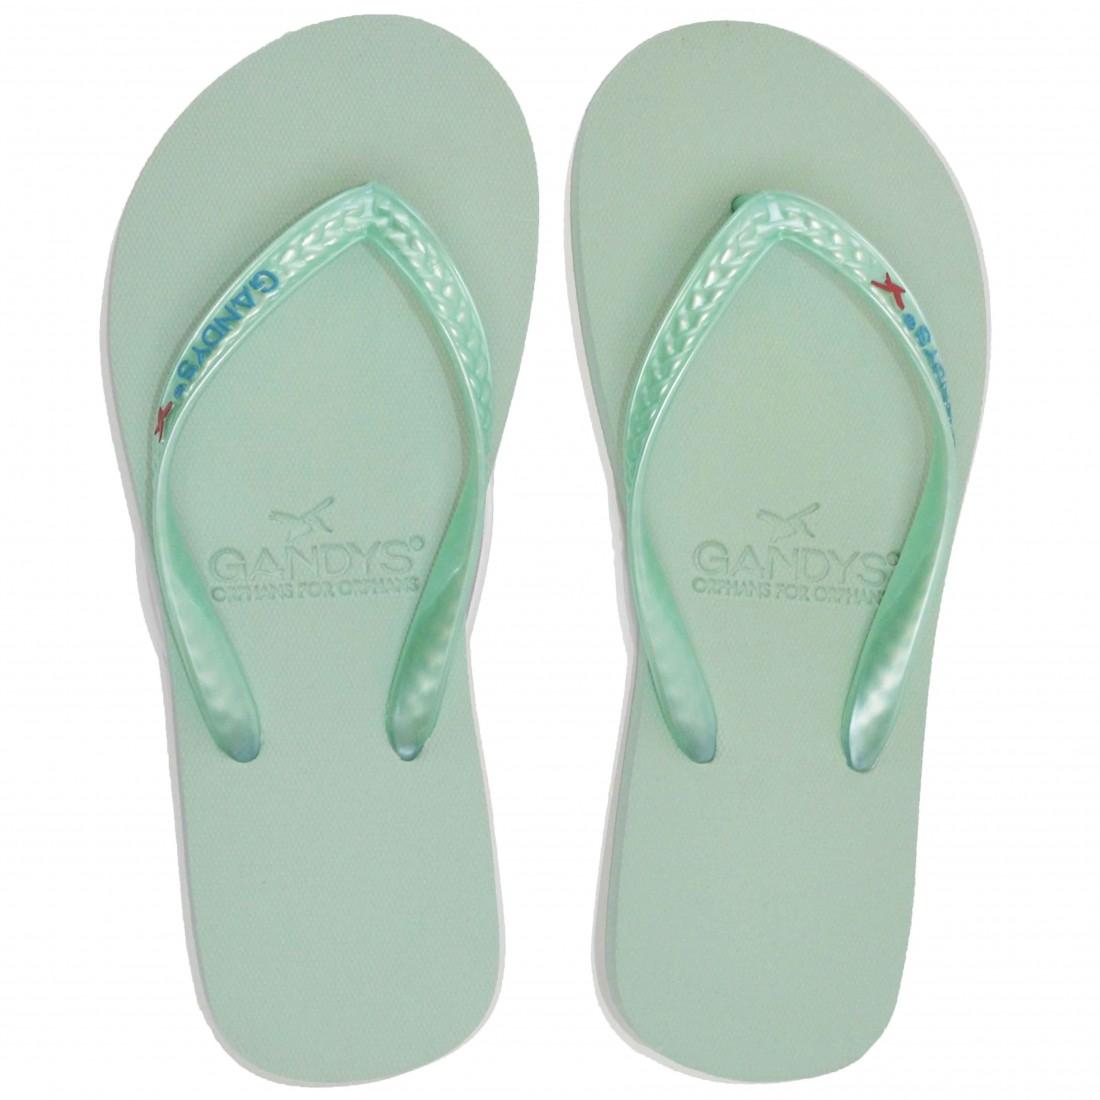 Gandys Flip Flops - Opal/Turquoise